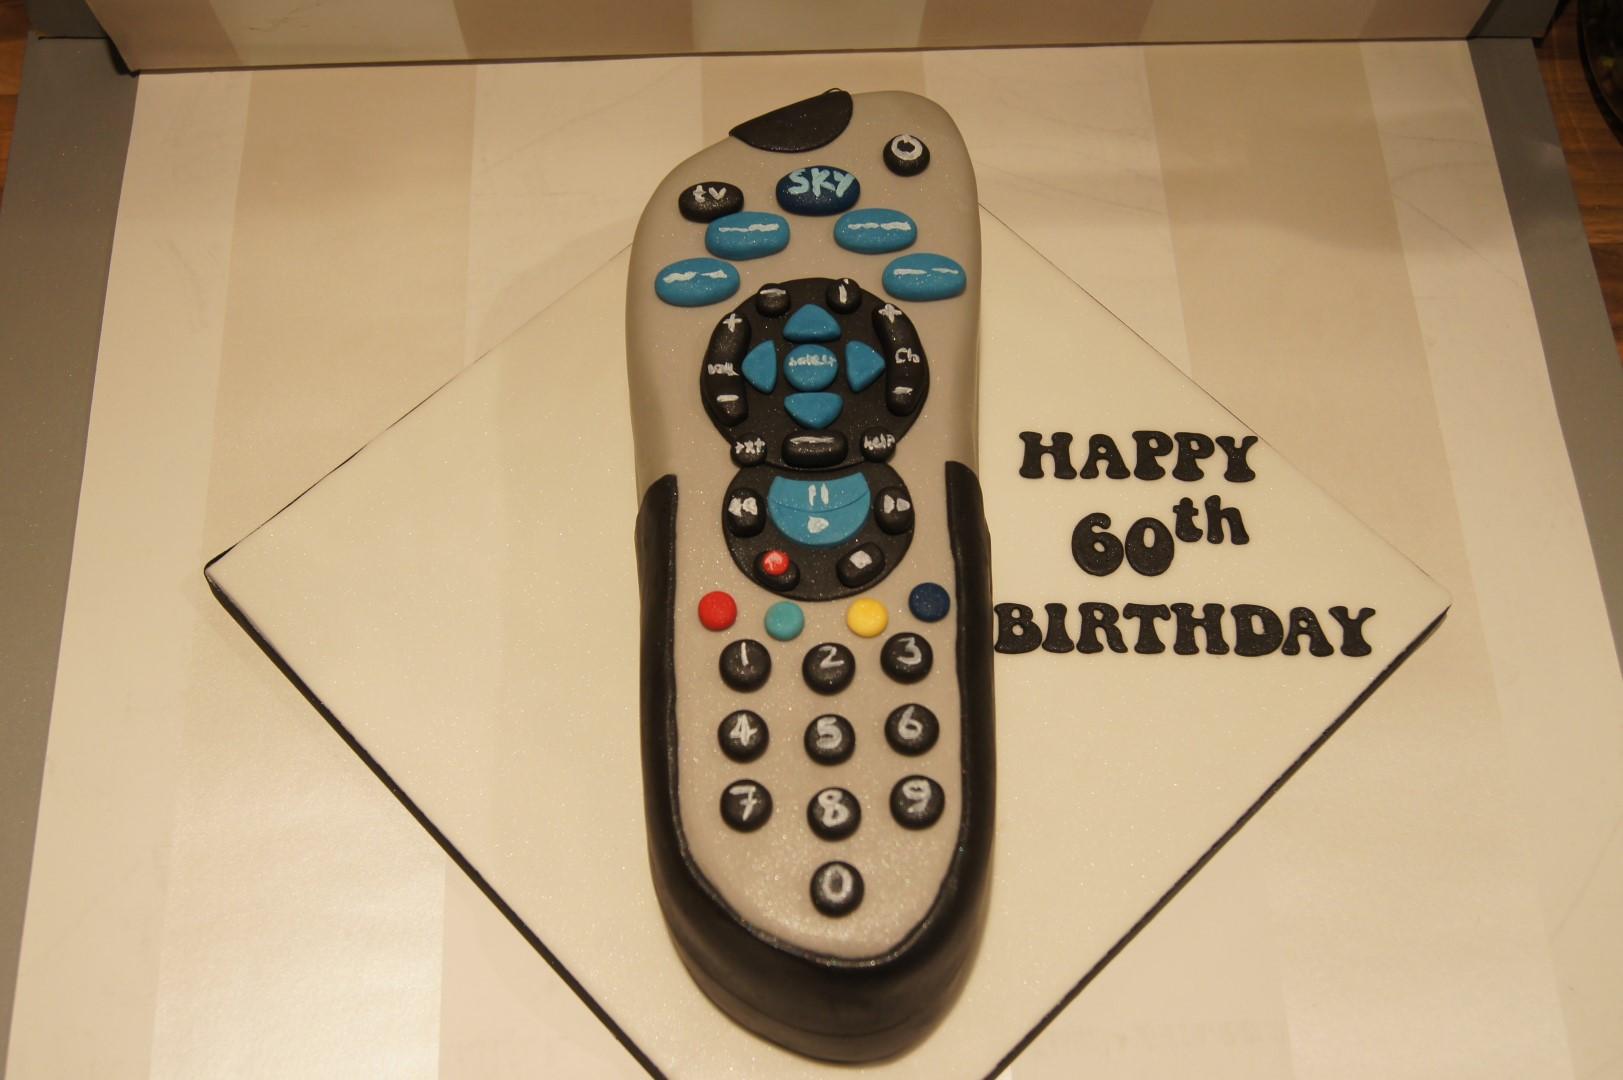 Sky Box Remote Control Cake